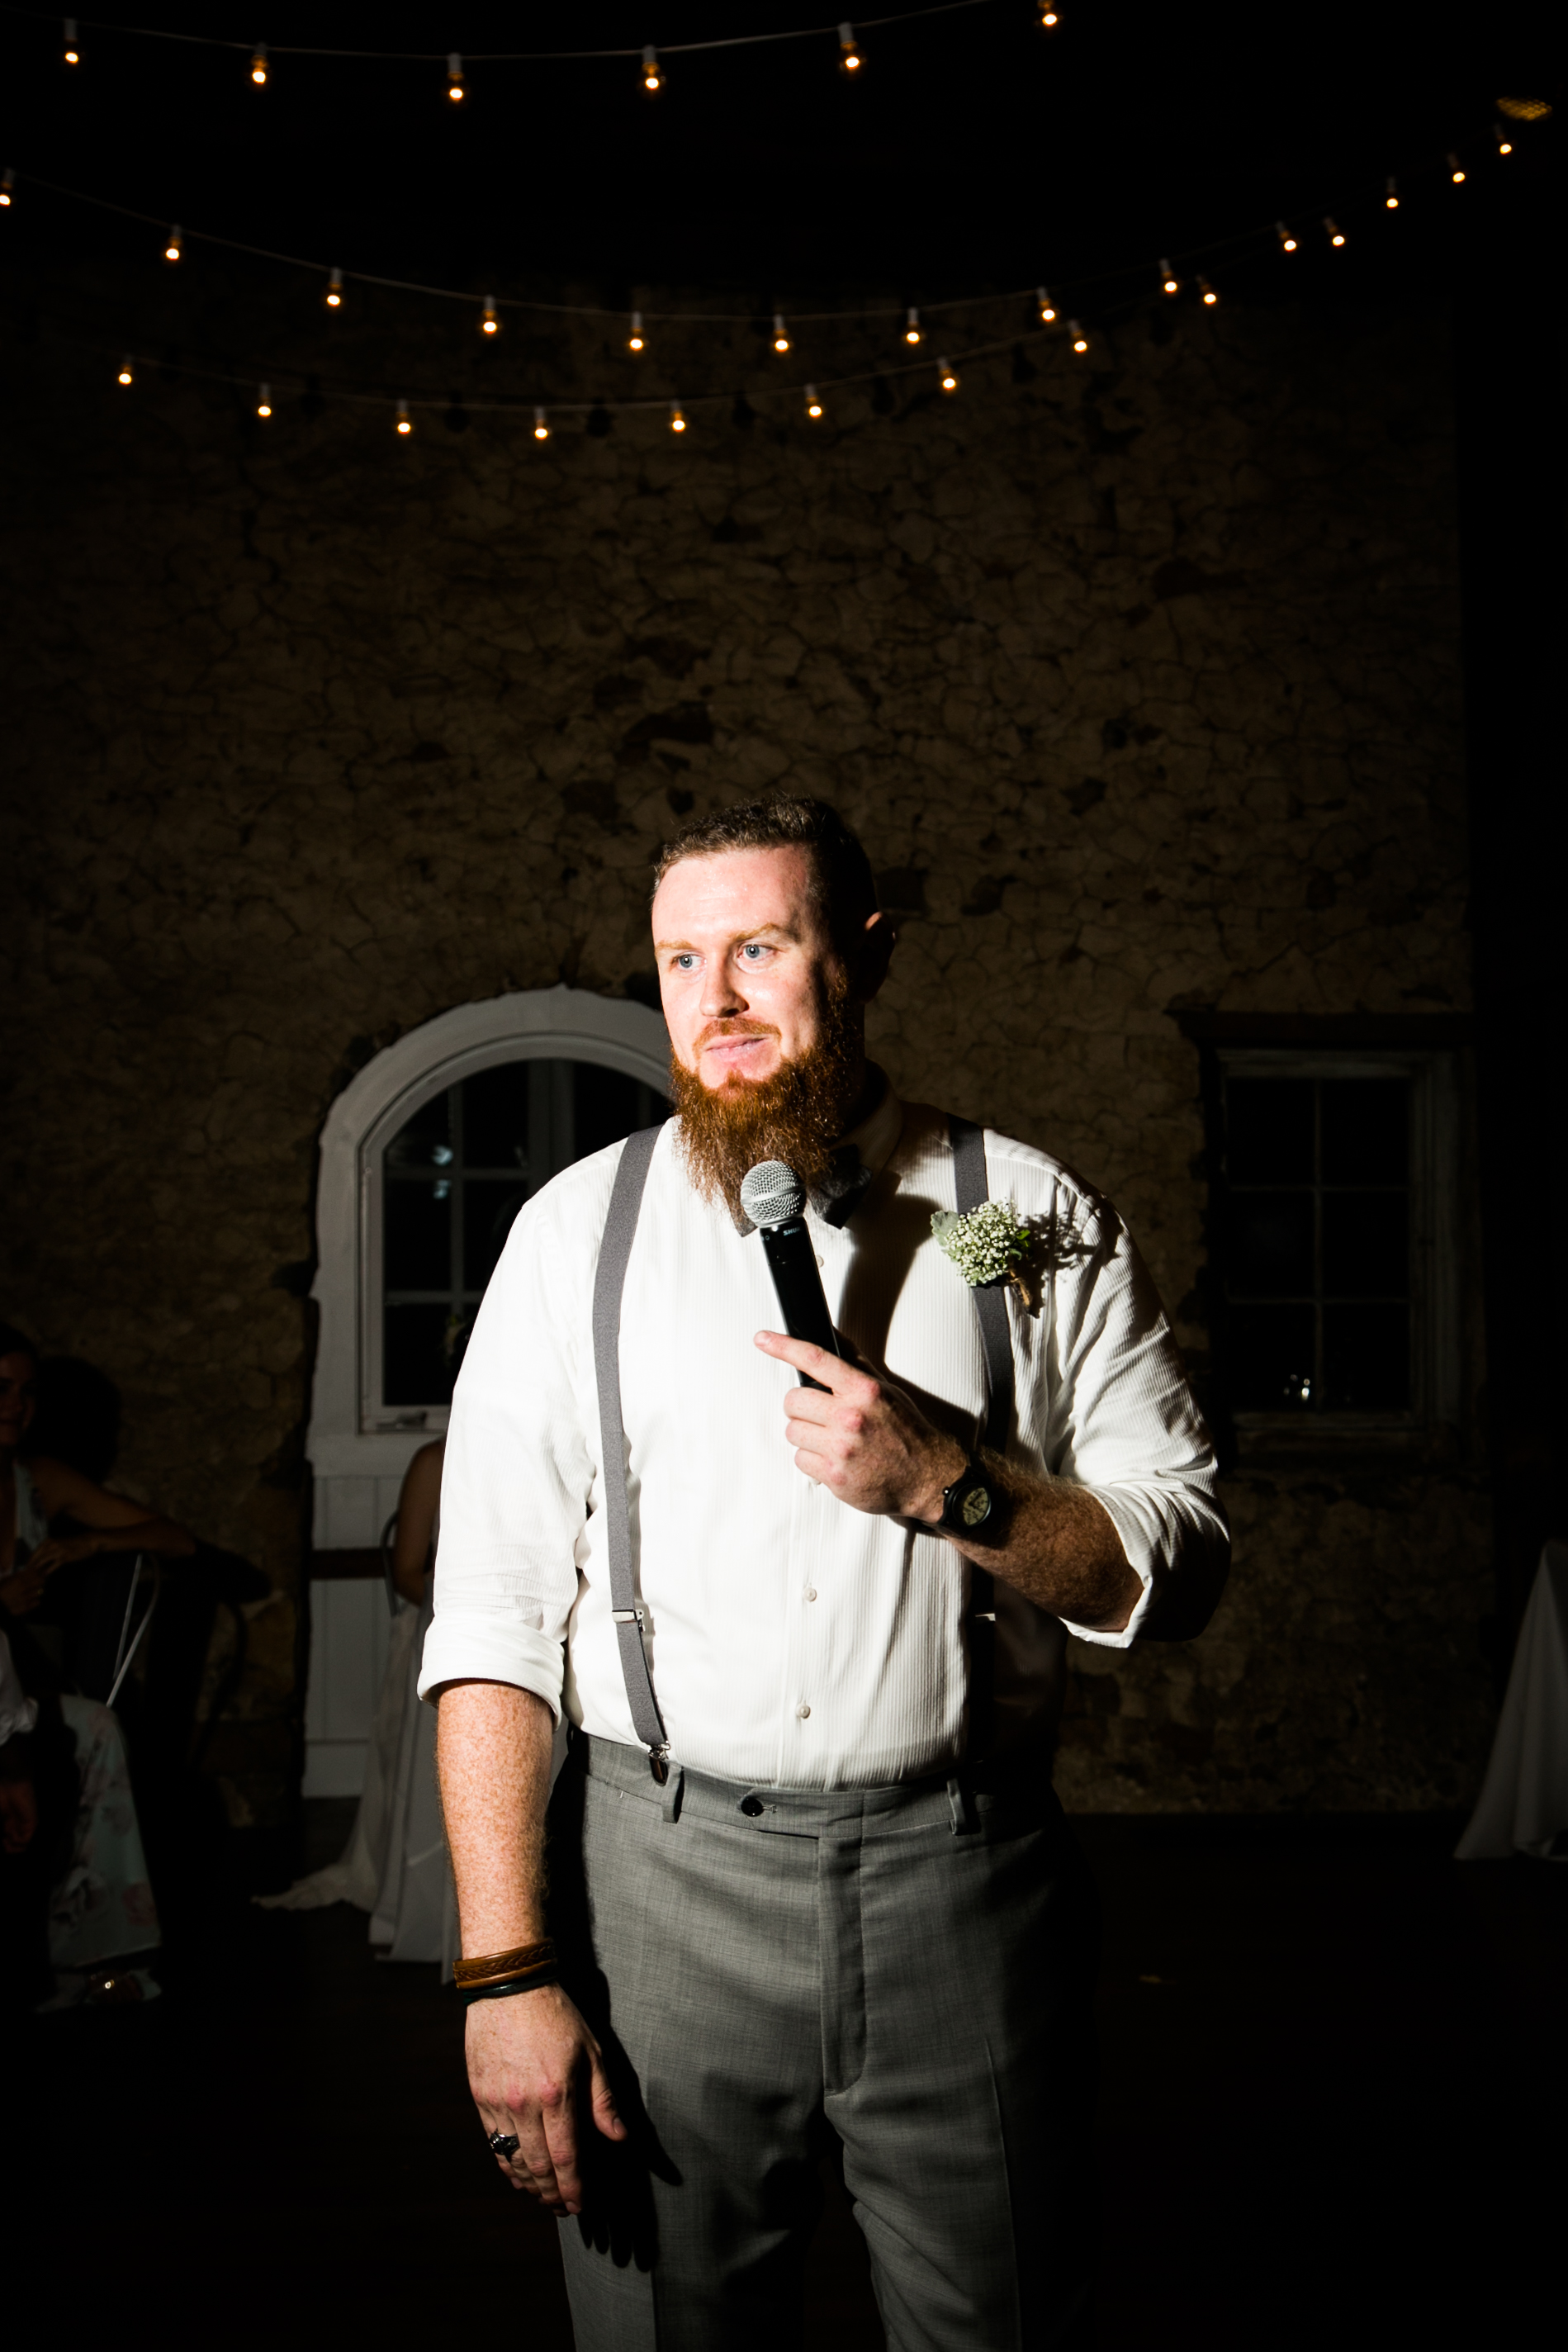 TYLER ARBORETUM WEDDING PHOTOGRAPHY LOVESTRUCK PICTURES-088.jpg